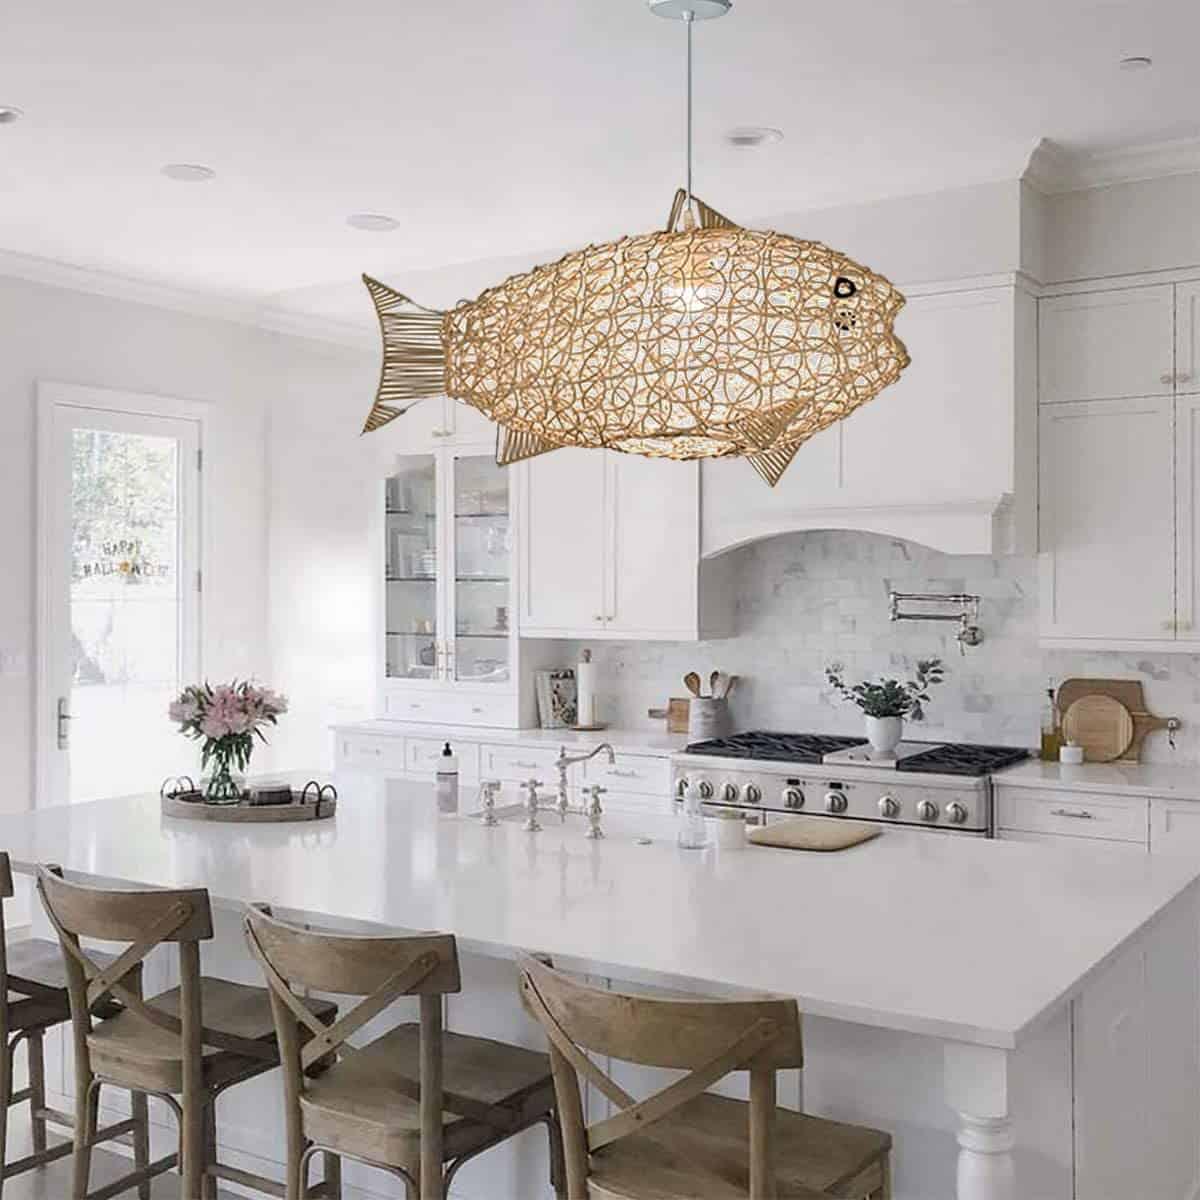 White kitchen with marble backsplash, fish shaped rattan pendant light fixture, rustic wood bar stools